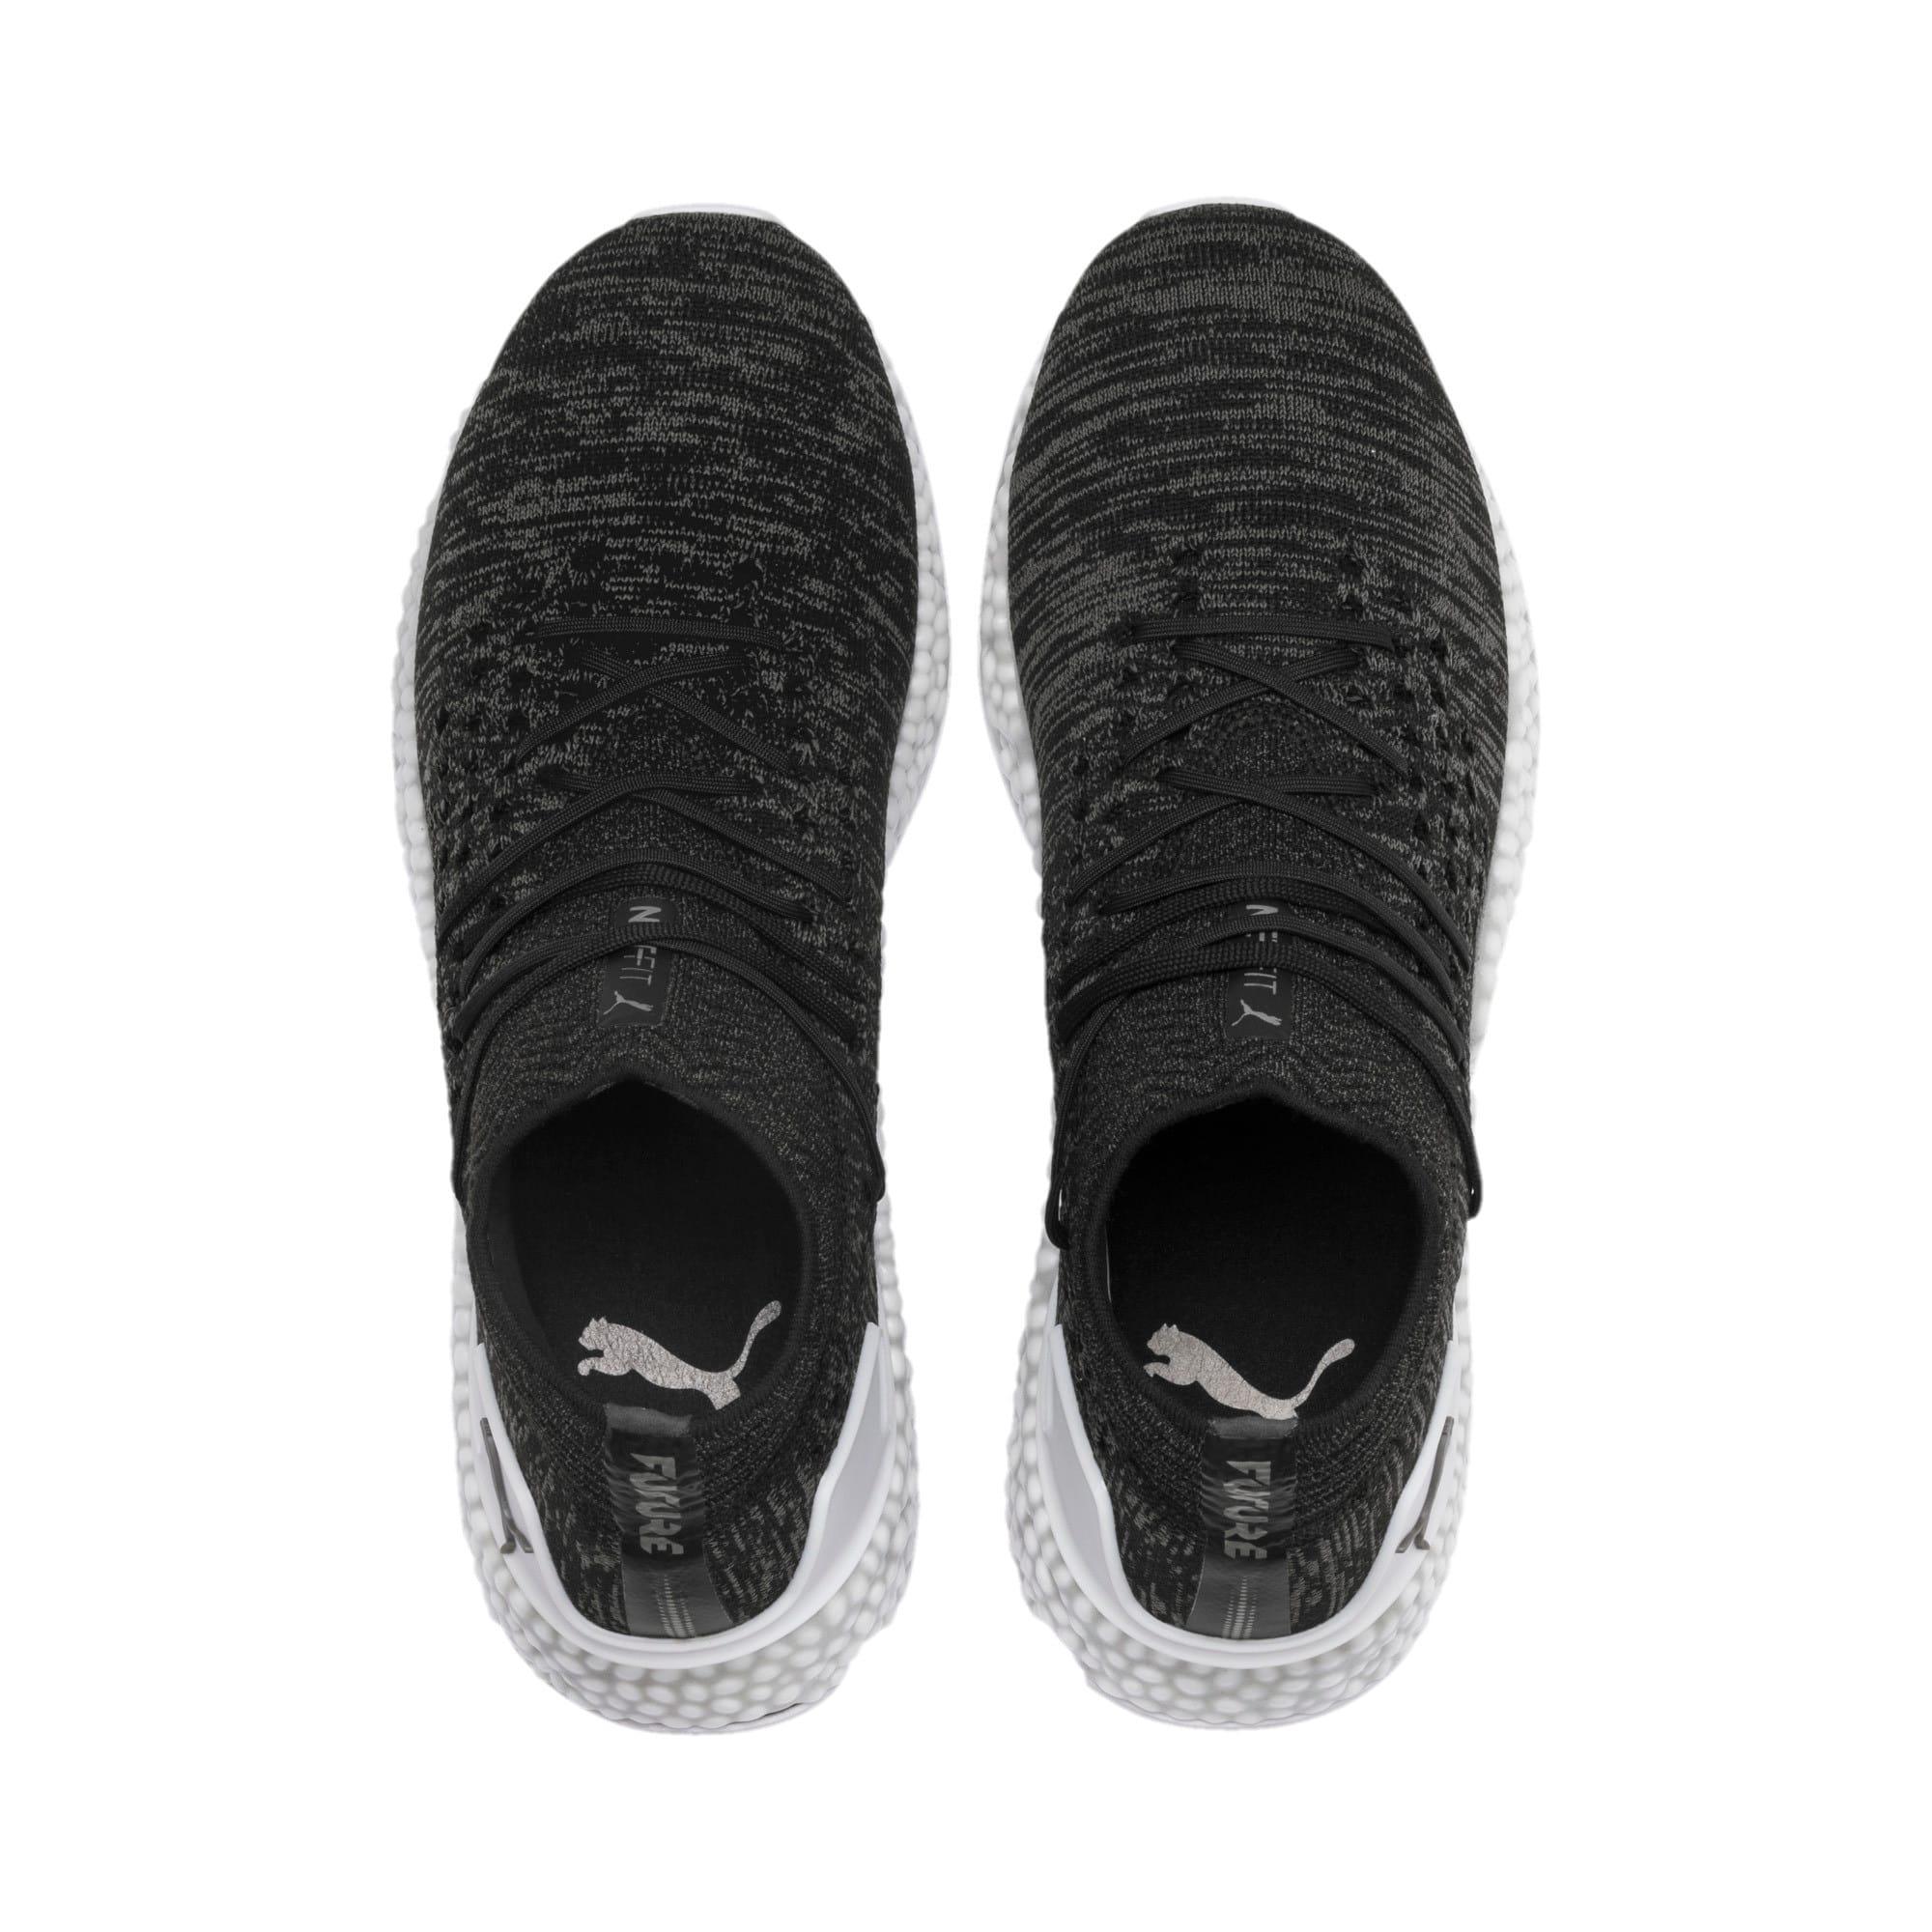 Thumbnail 7 of FUTURE Orbiter Men's Soccer Shoes, Black-Black-Puma Aged Silver, medium